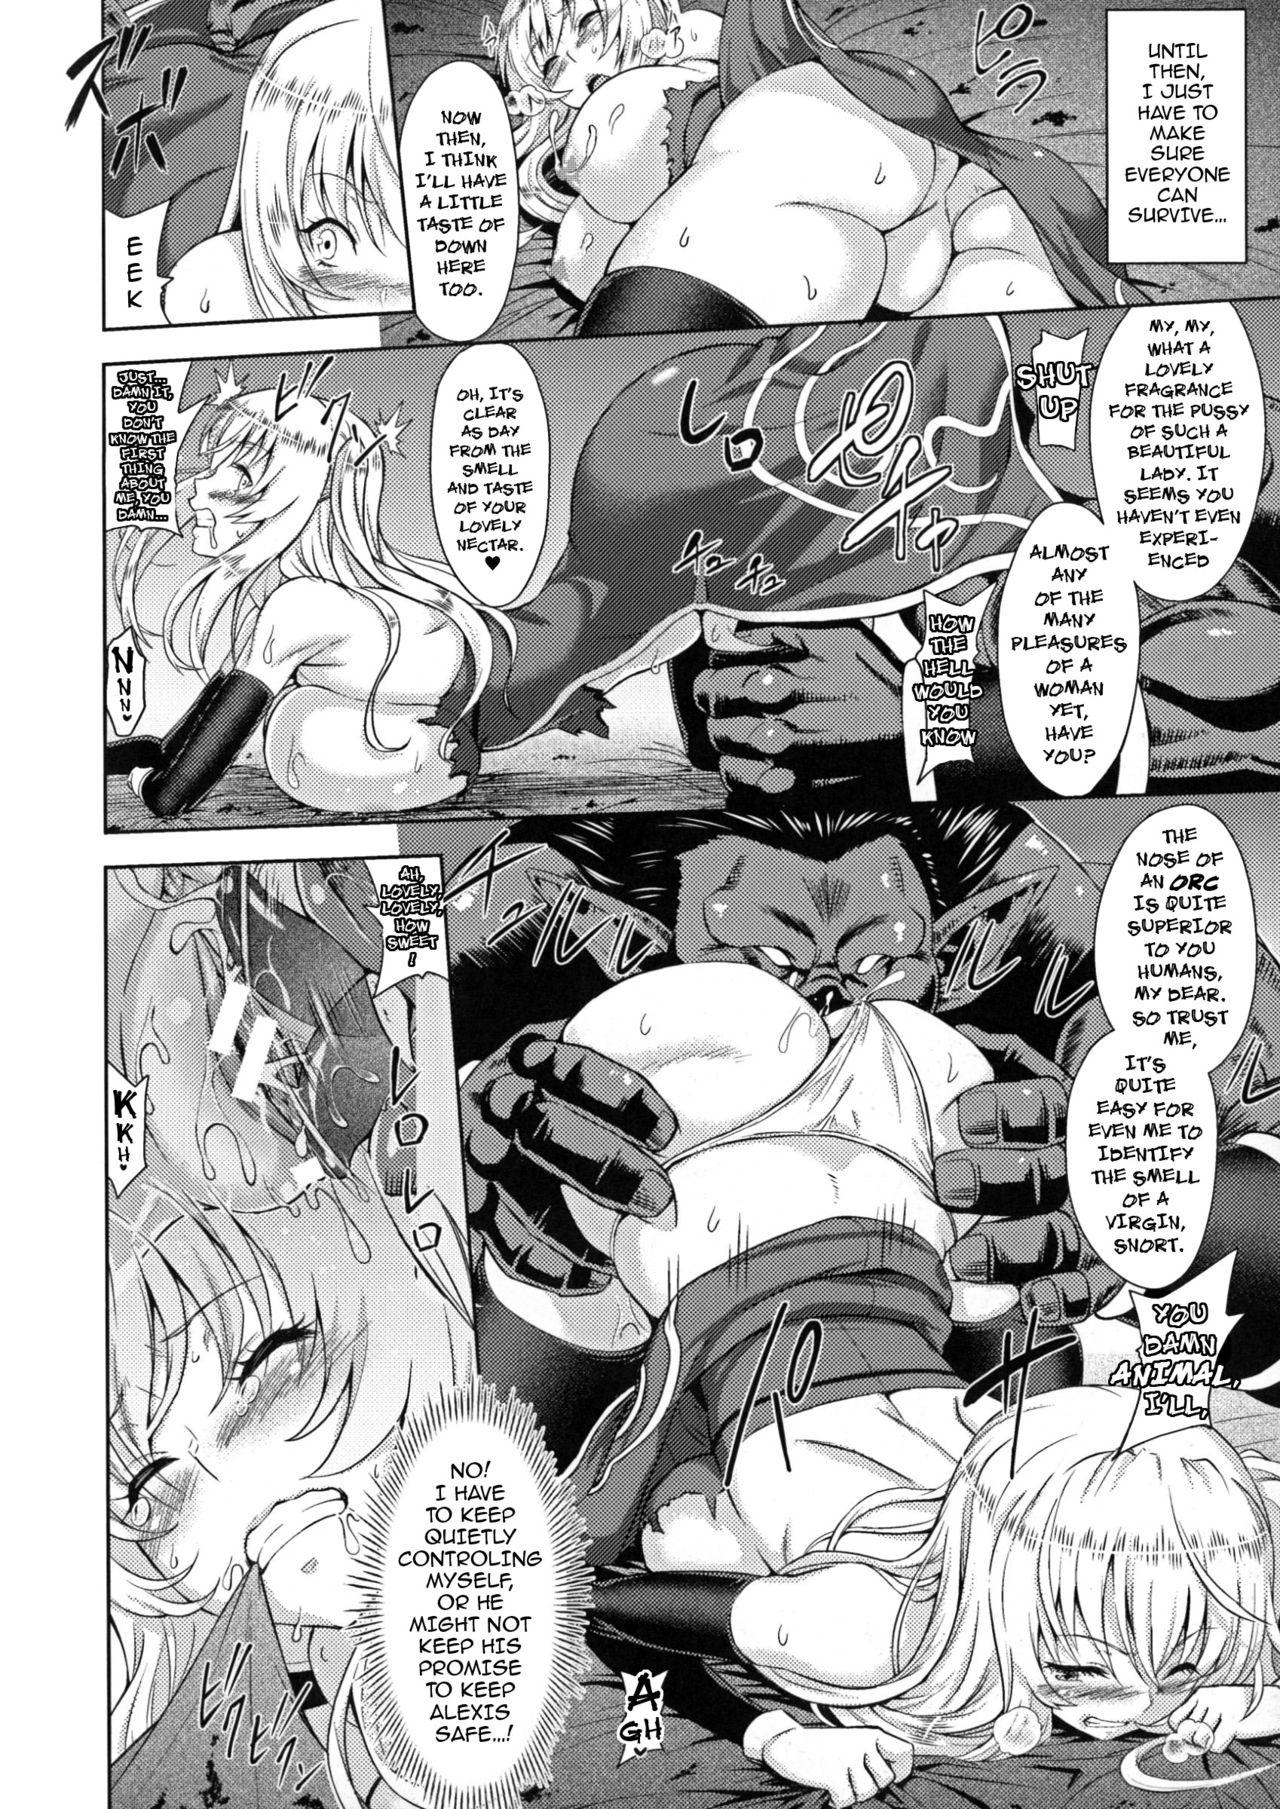 [Yamada Gogogo] Erona ~Orc no Inmon ni Okasareta Onna Kishi no Matsuro~ | Erona ~The Fall of a Beautiful Knight Cursed with the Lewd Mark of an Orc~ Ch. 1-5 [English] {darknight} 14